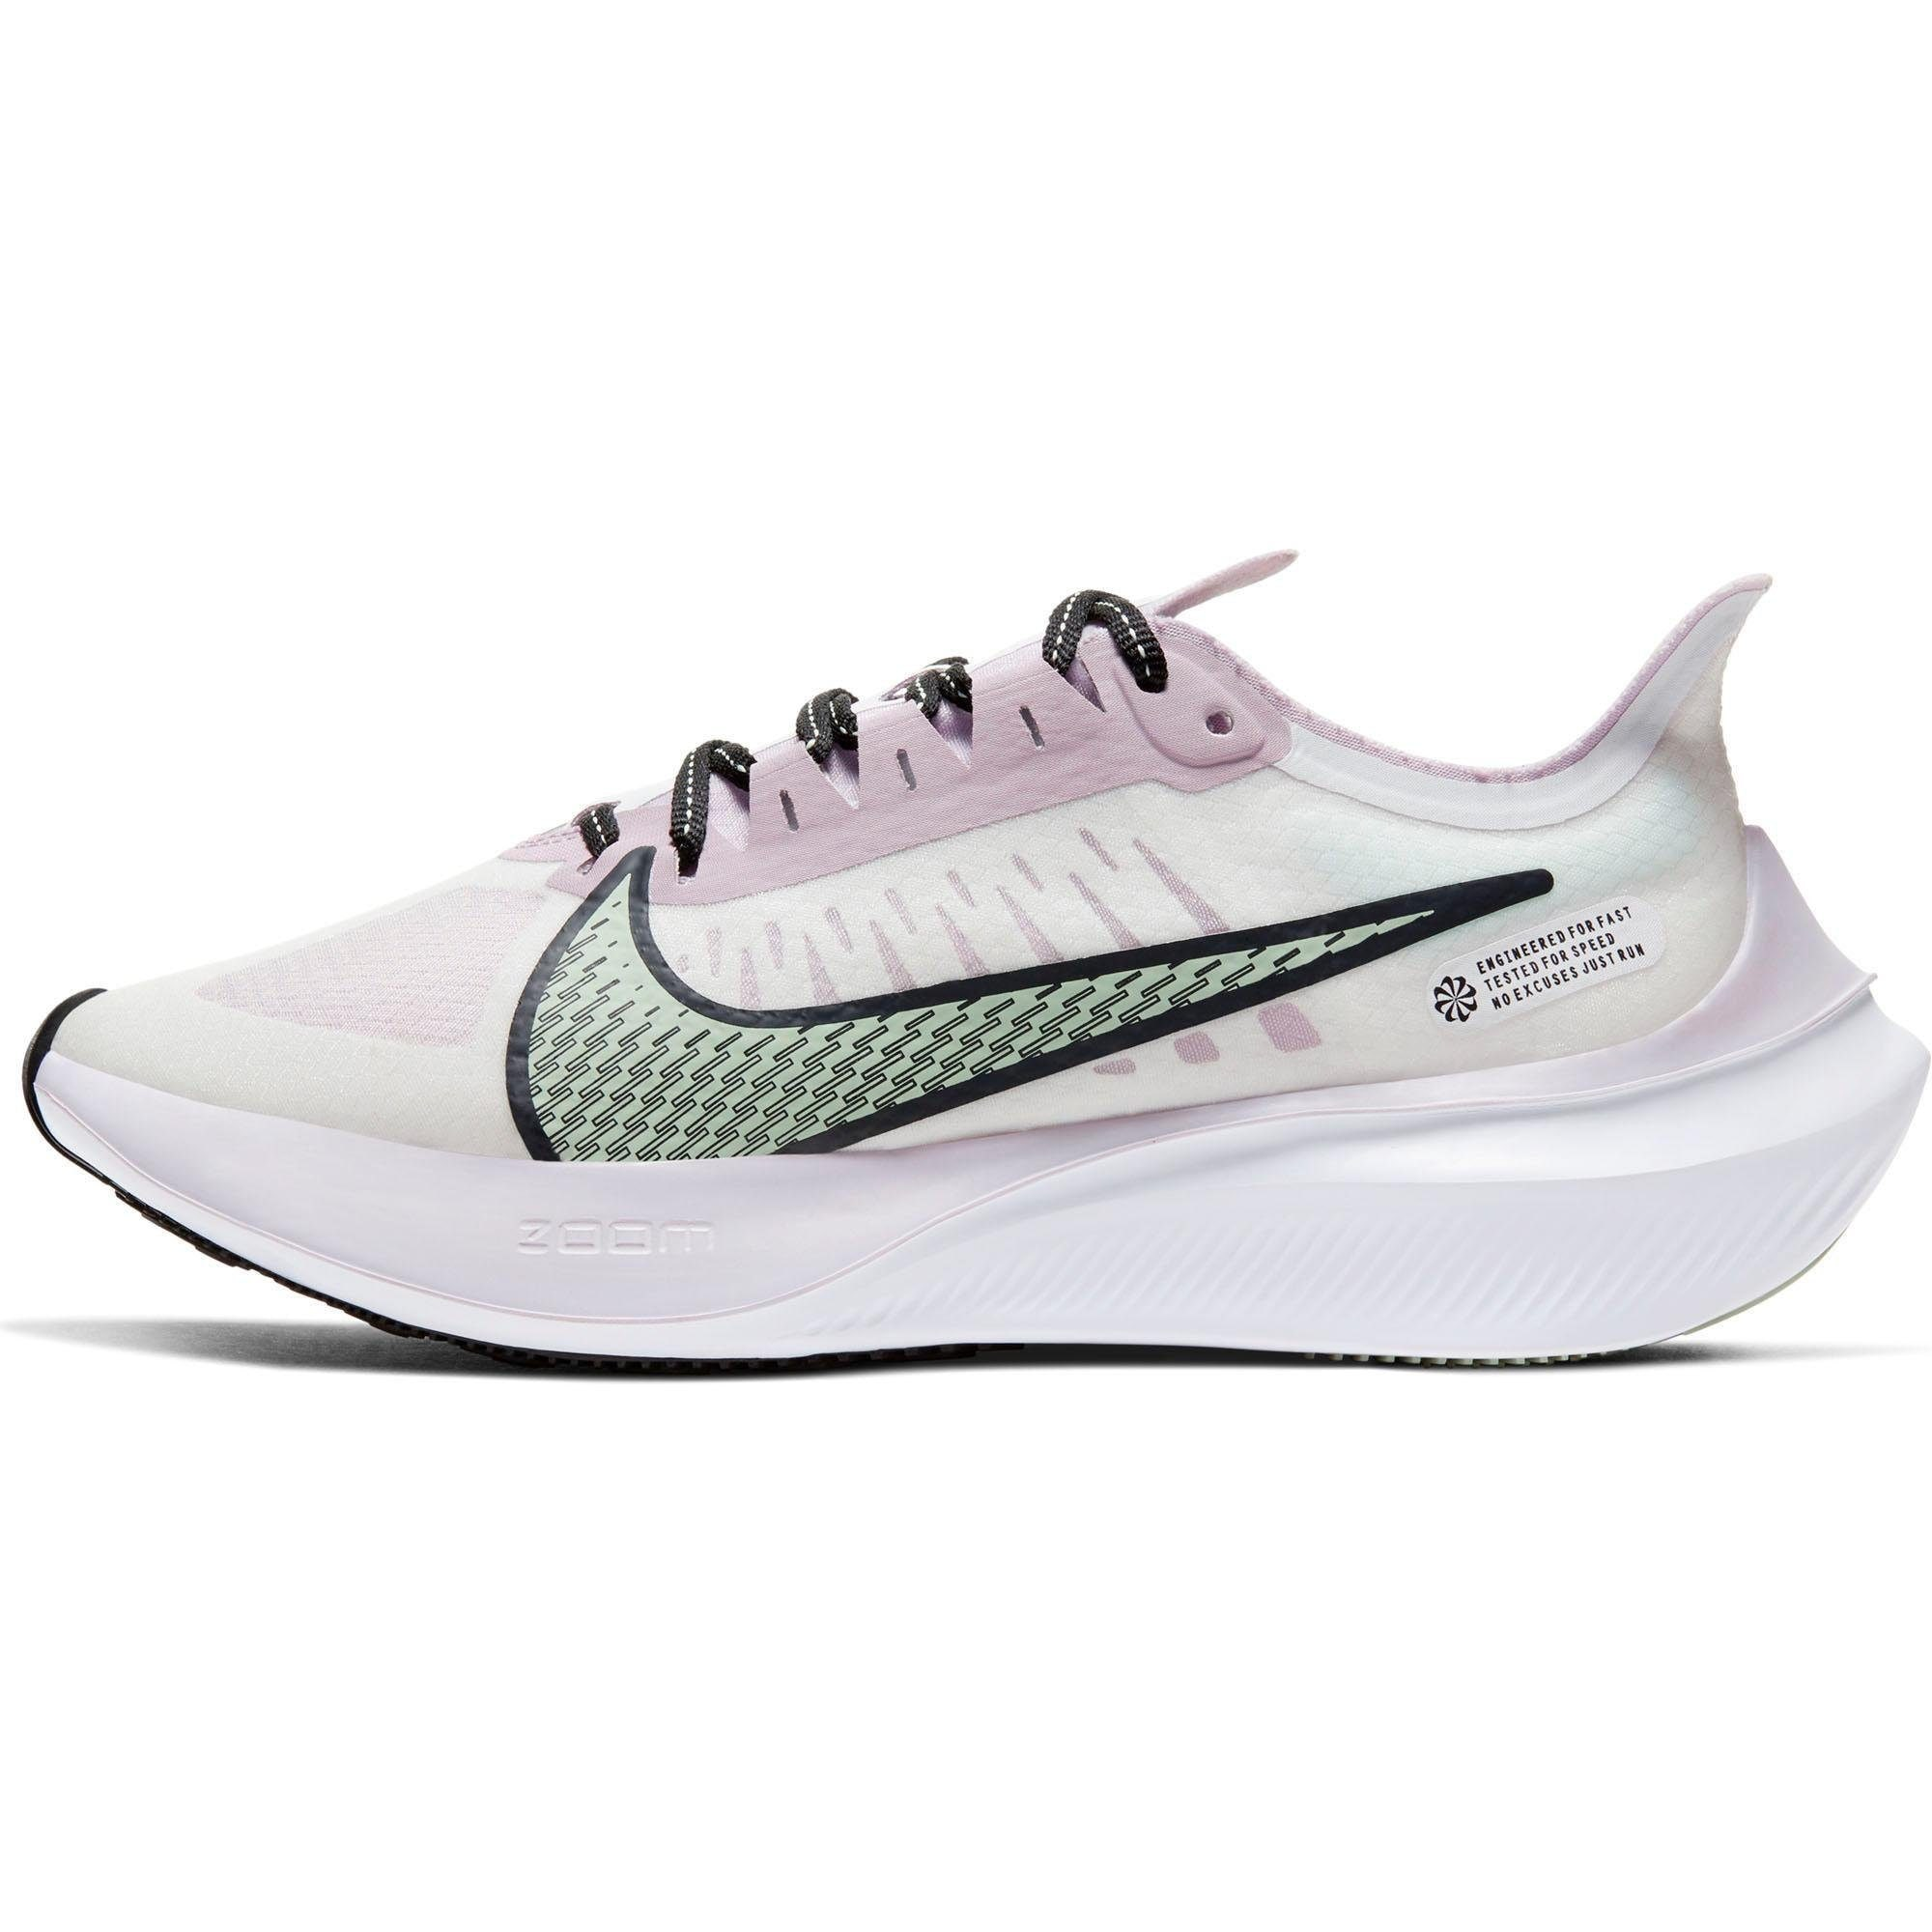 Nike Laufschuh Wmns Zoom Gravity